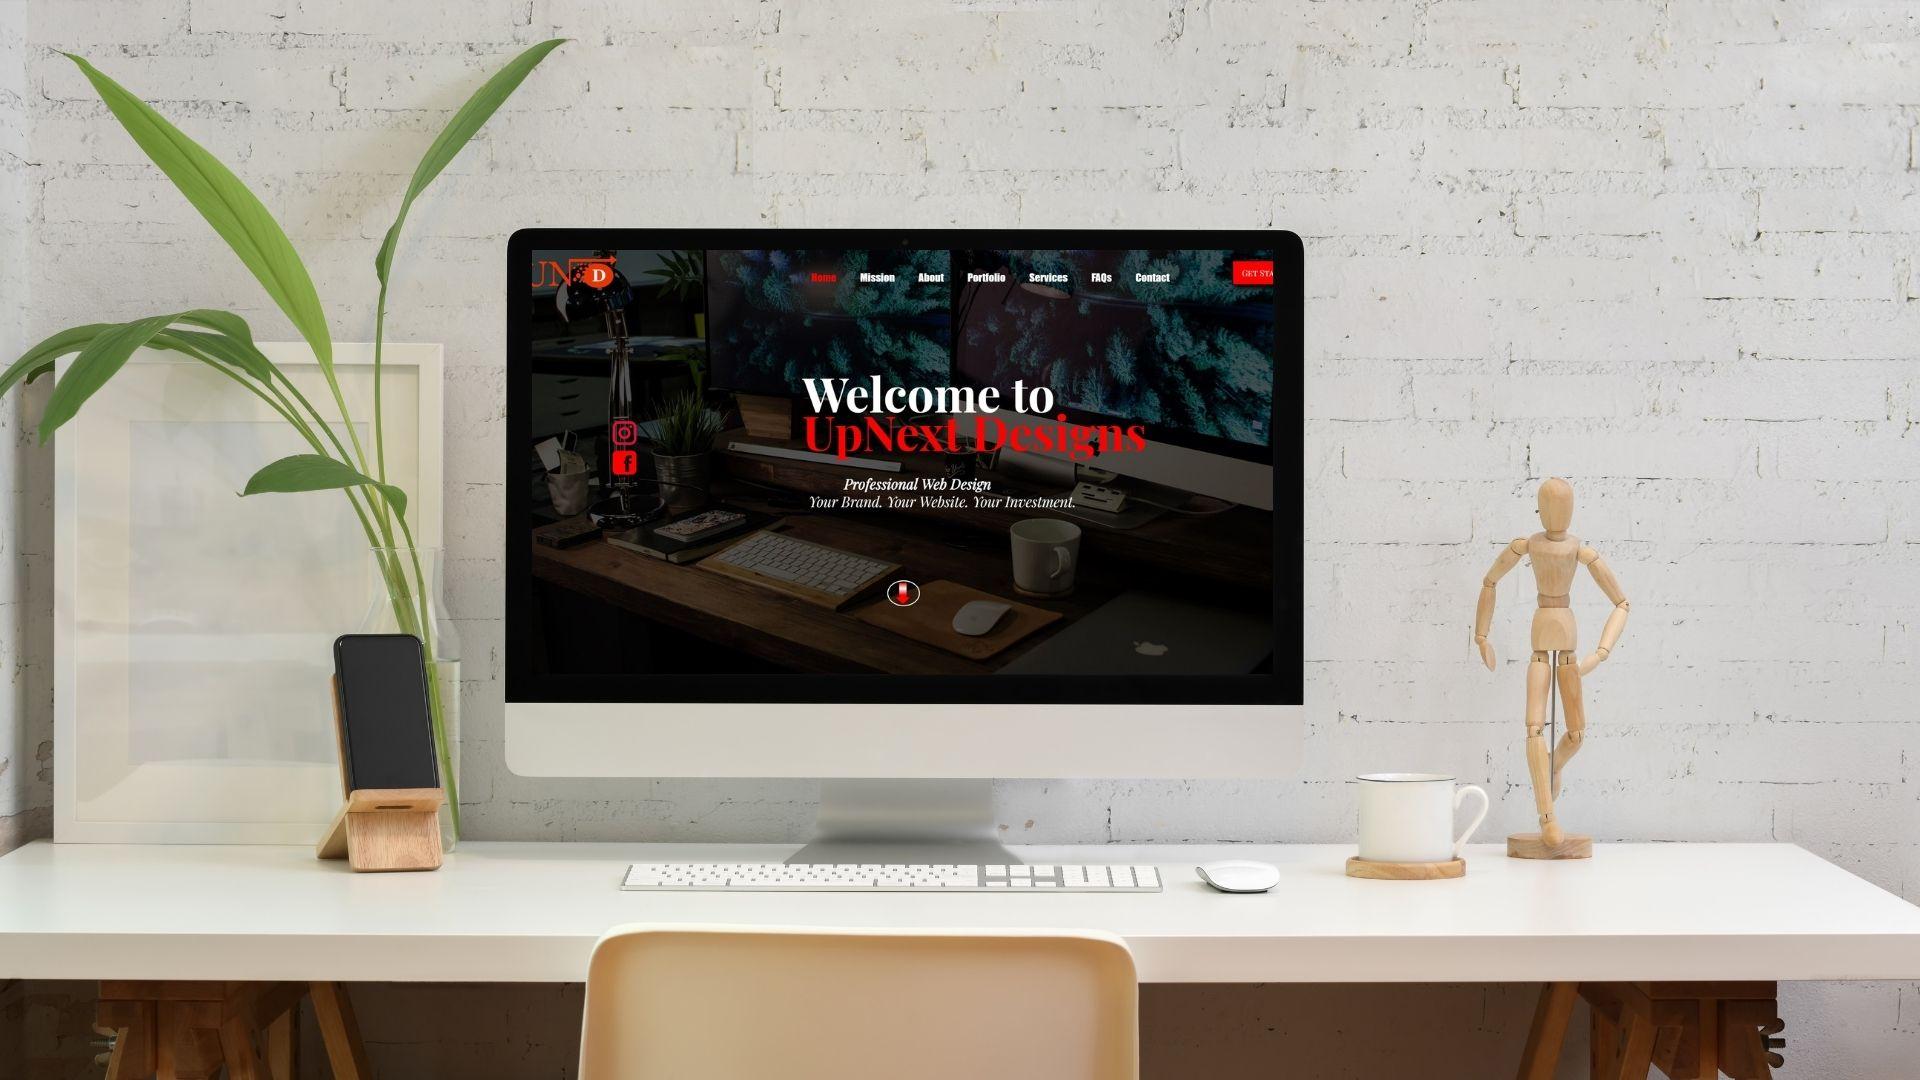 UpNext Designs LLC